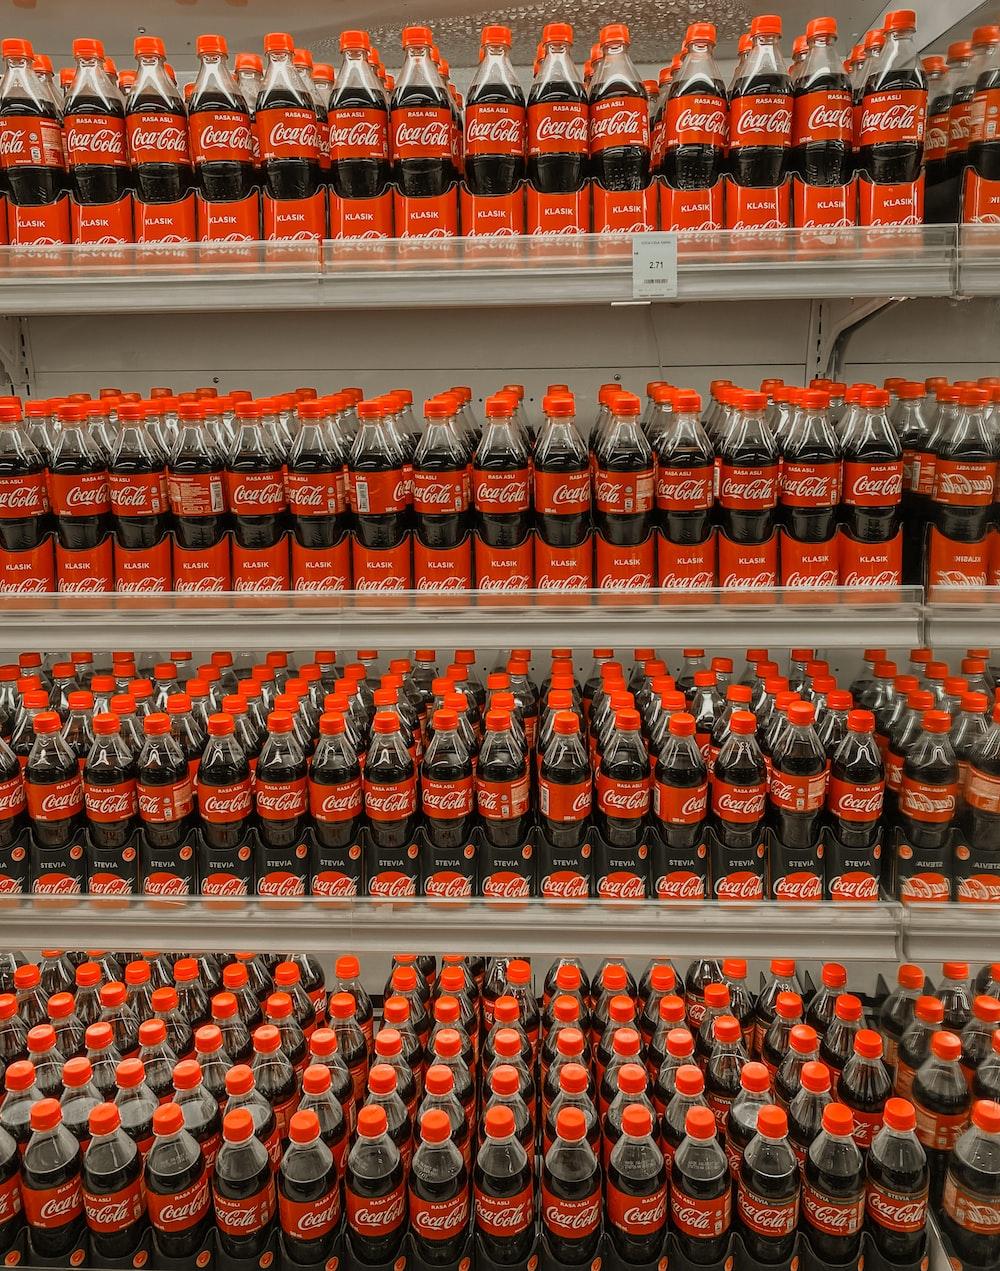 coca cola bottle on shelf